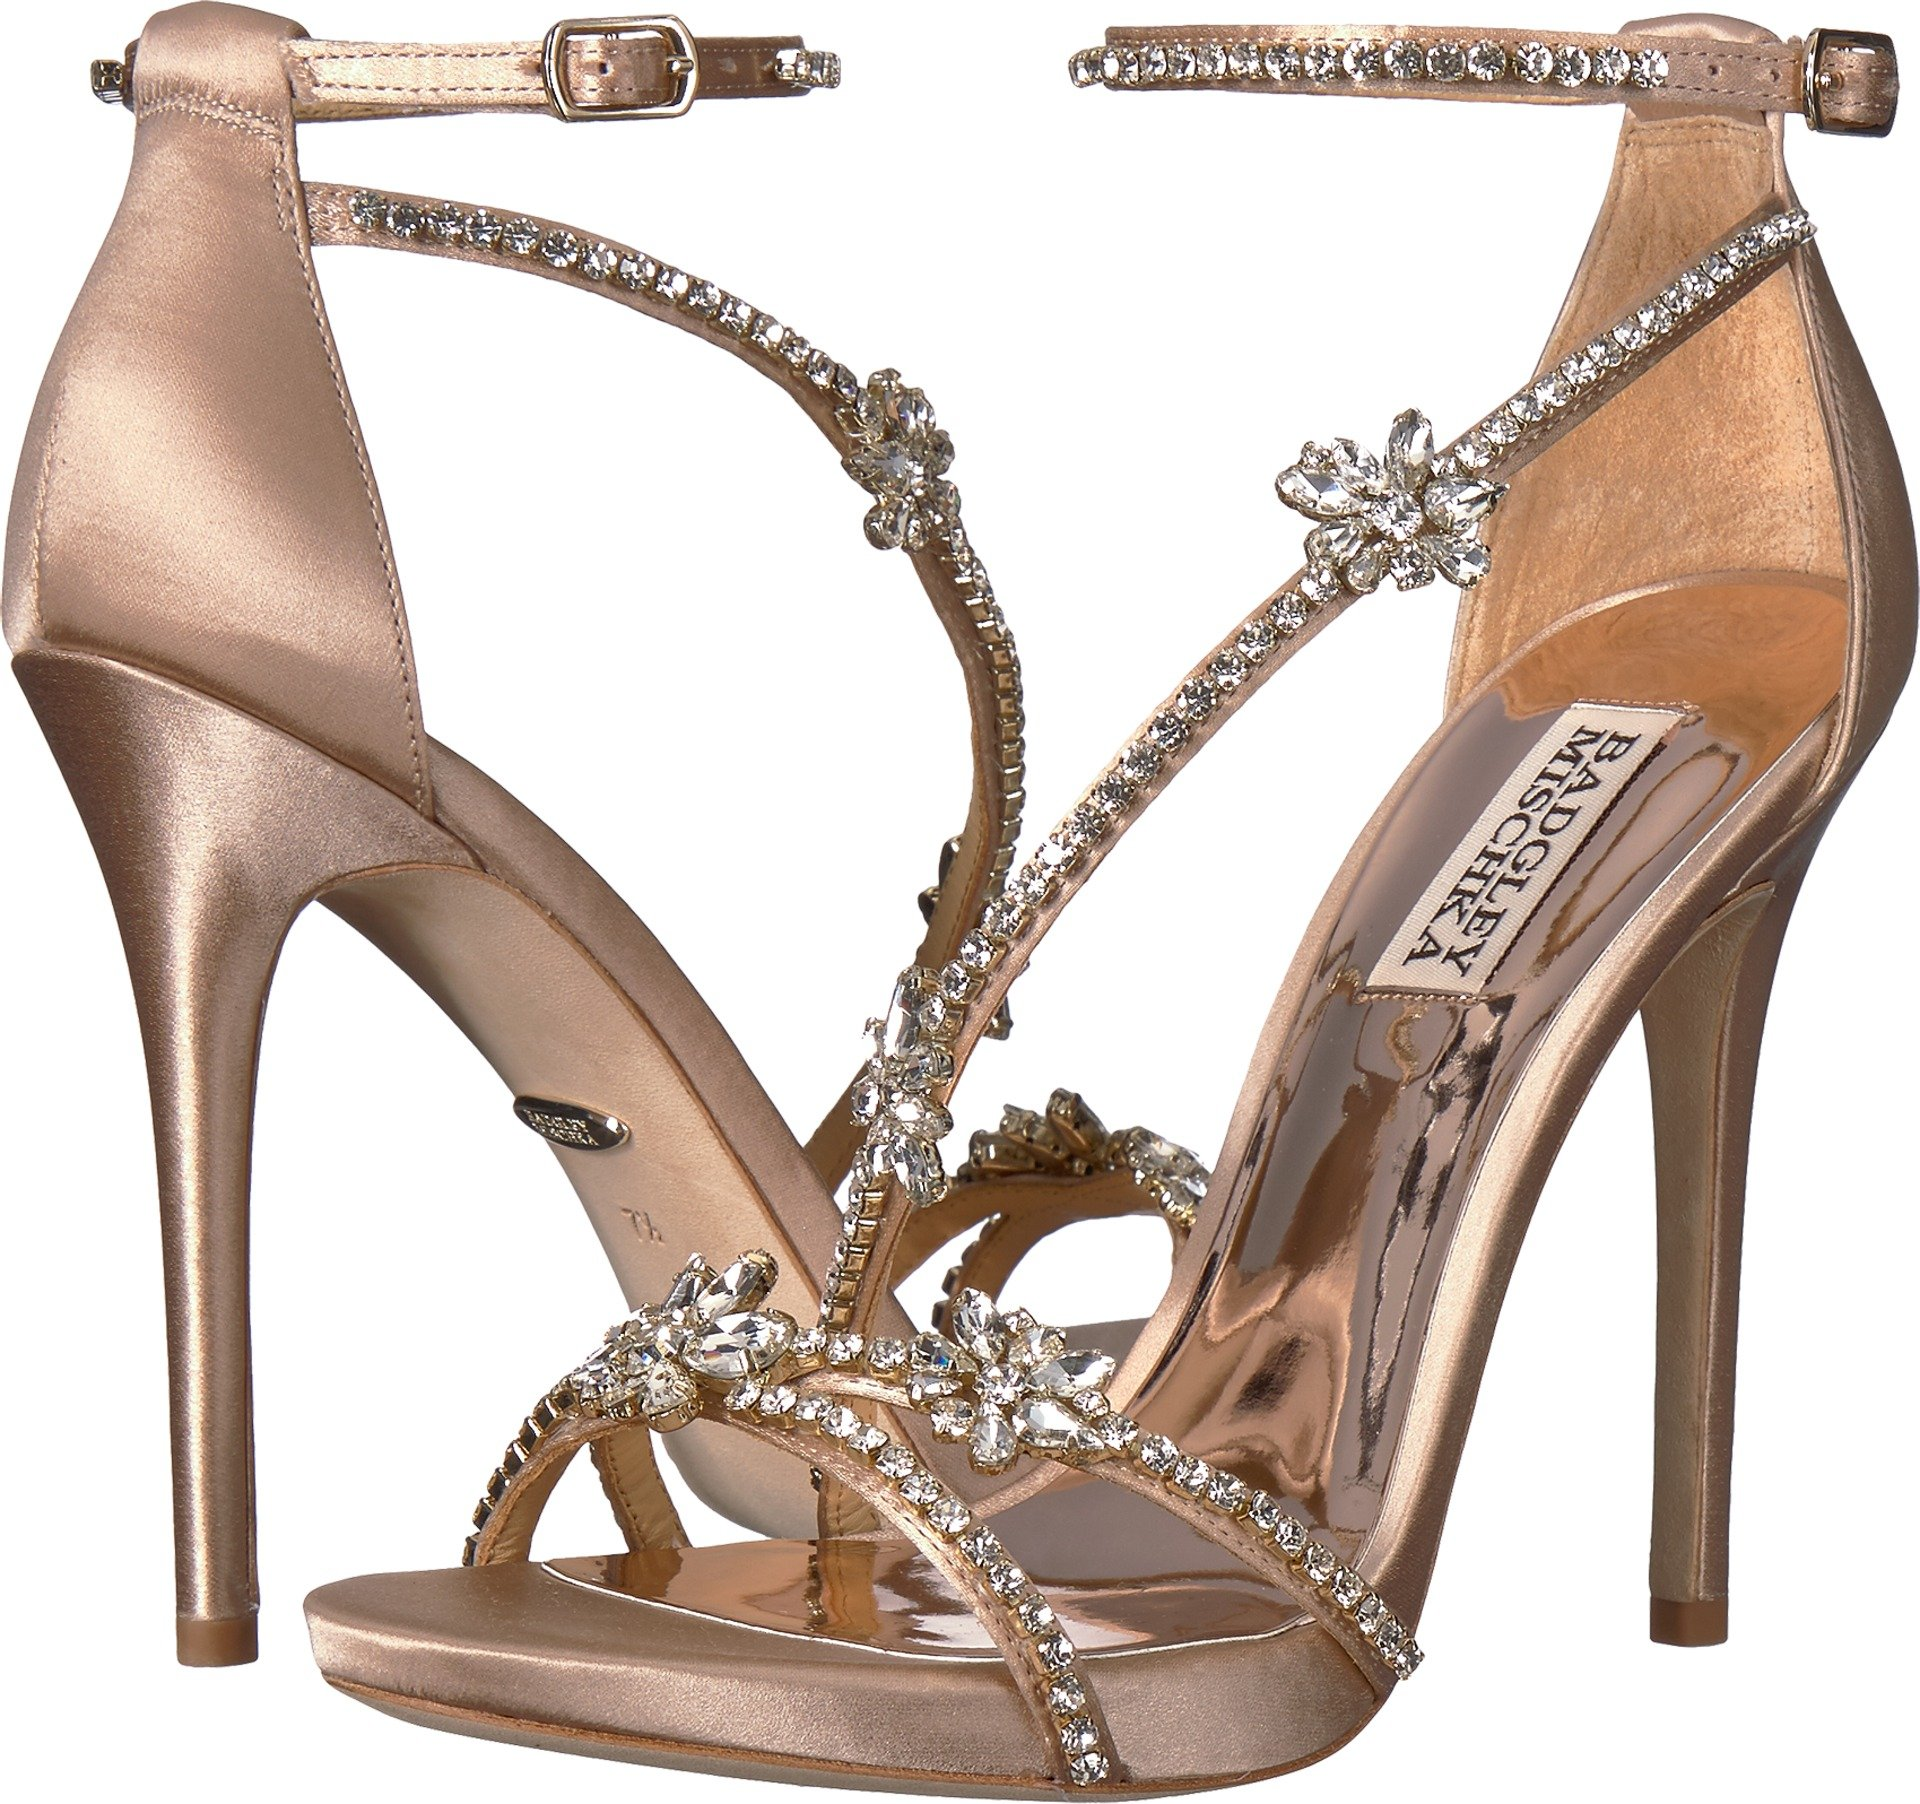 Badgley Mischka Women's Hodge Heeled Sandal, Latte, 7.5 M US